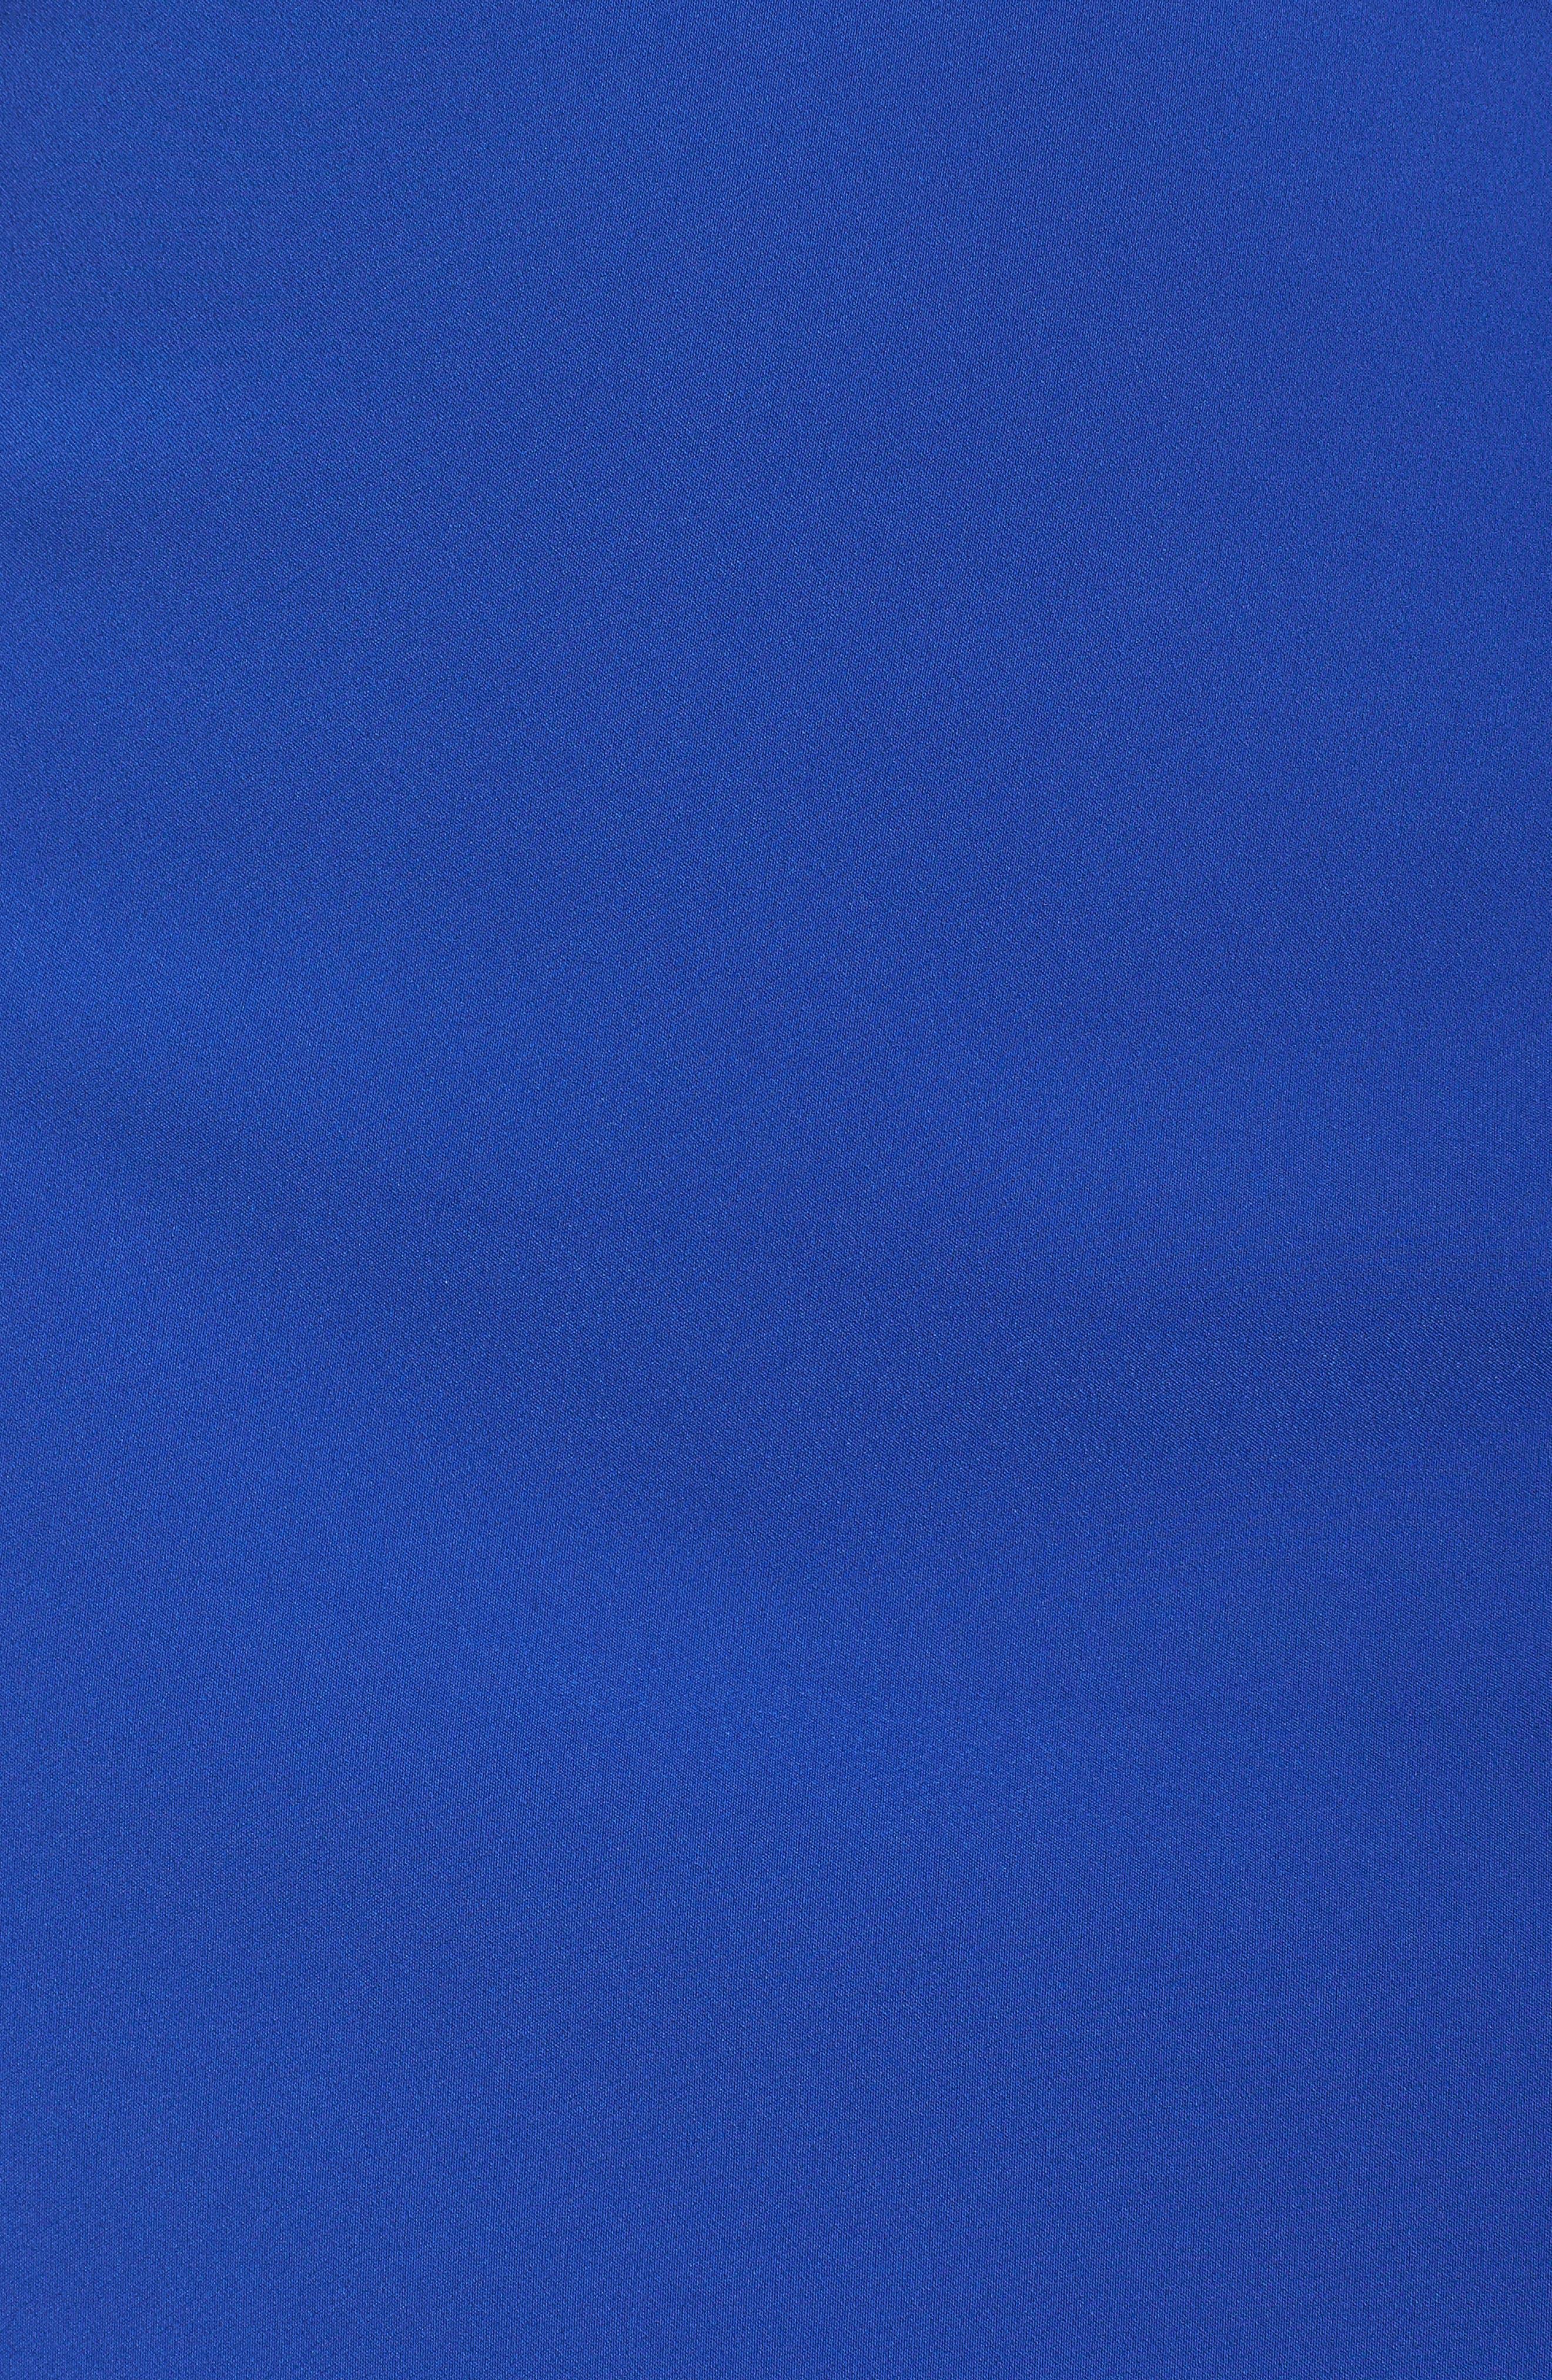 Taylor Racer Cutout Asymmetrical Dress,                             Alternate thumbnail 5, color,                             Cobalt